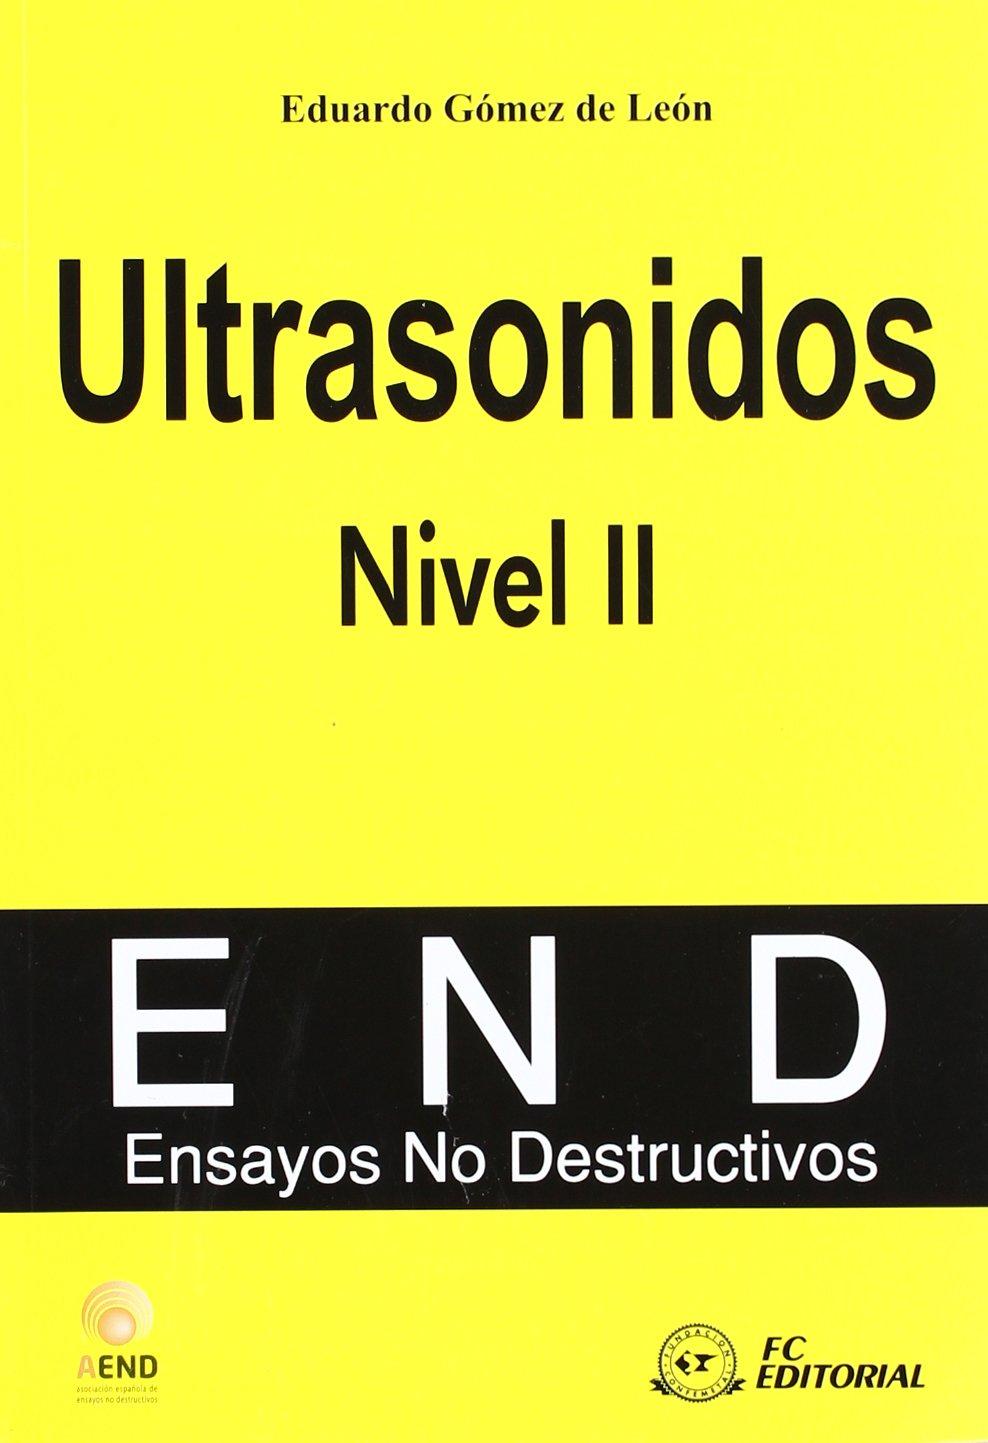 Ultrasonidos, nivel II (Spanish) Paperback – January 1, 2009